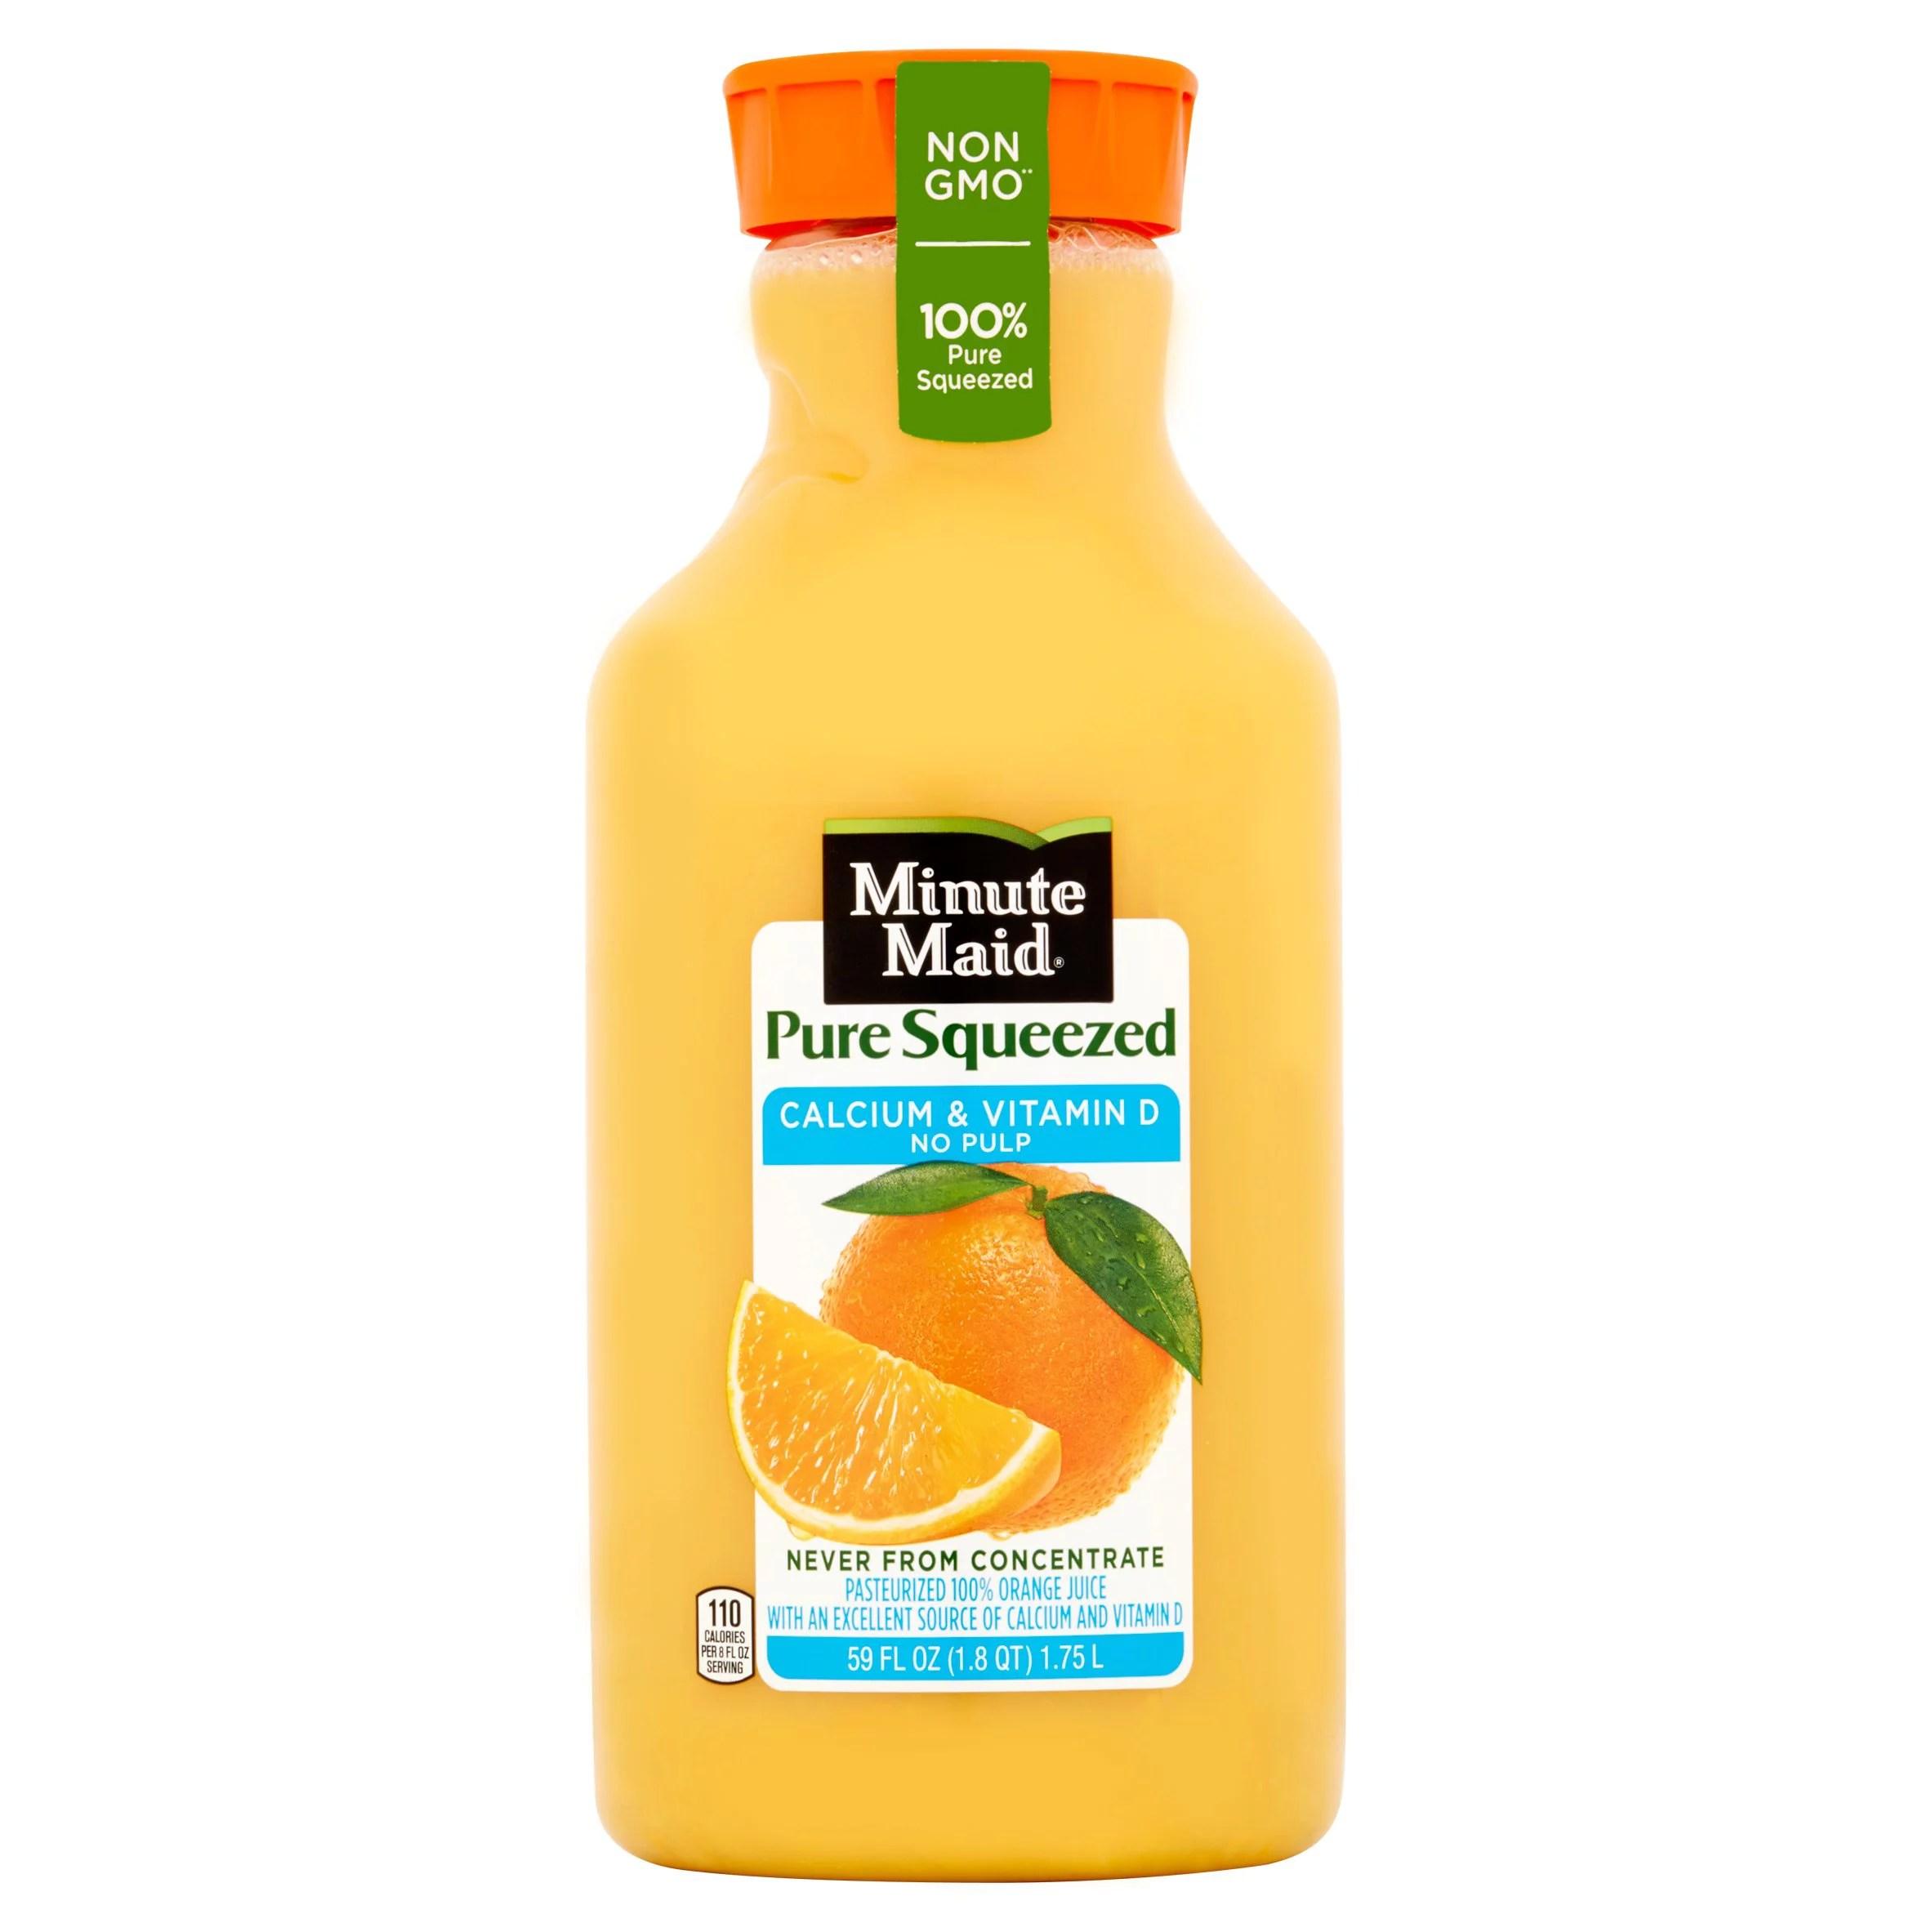 Minute Maid Pure Squeezed Pasteurized 100% Orange Juice ...